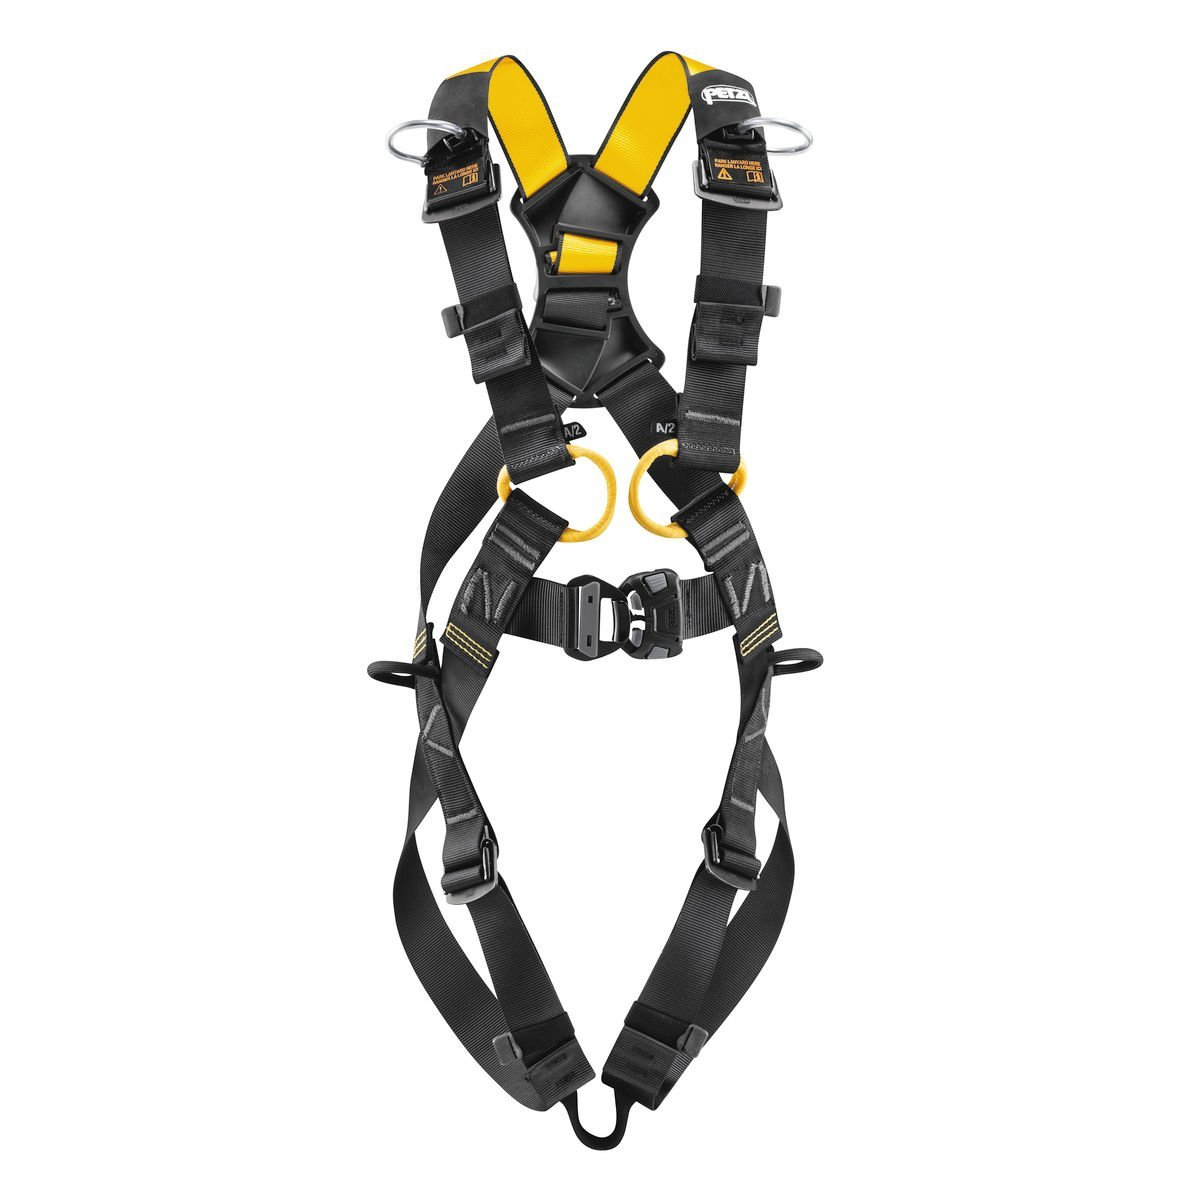 Petzl NEWTON full body harness ANSI CSA Size 1